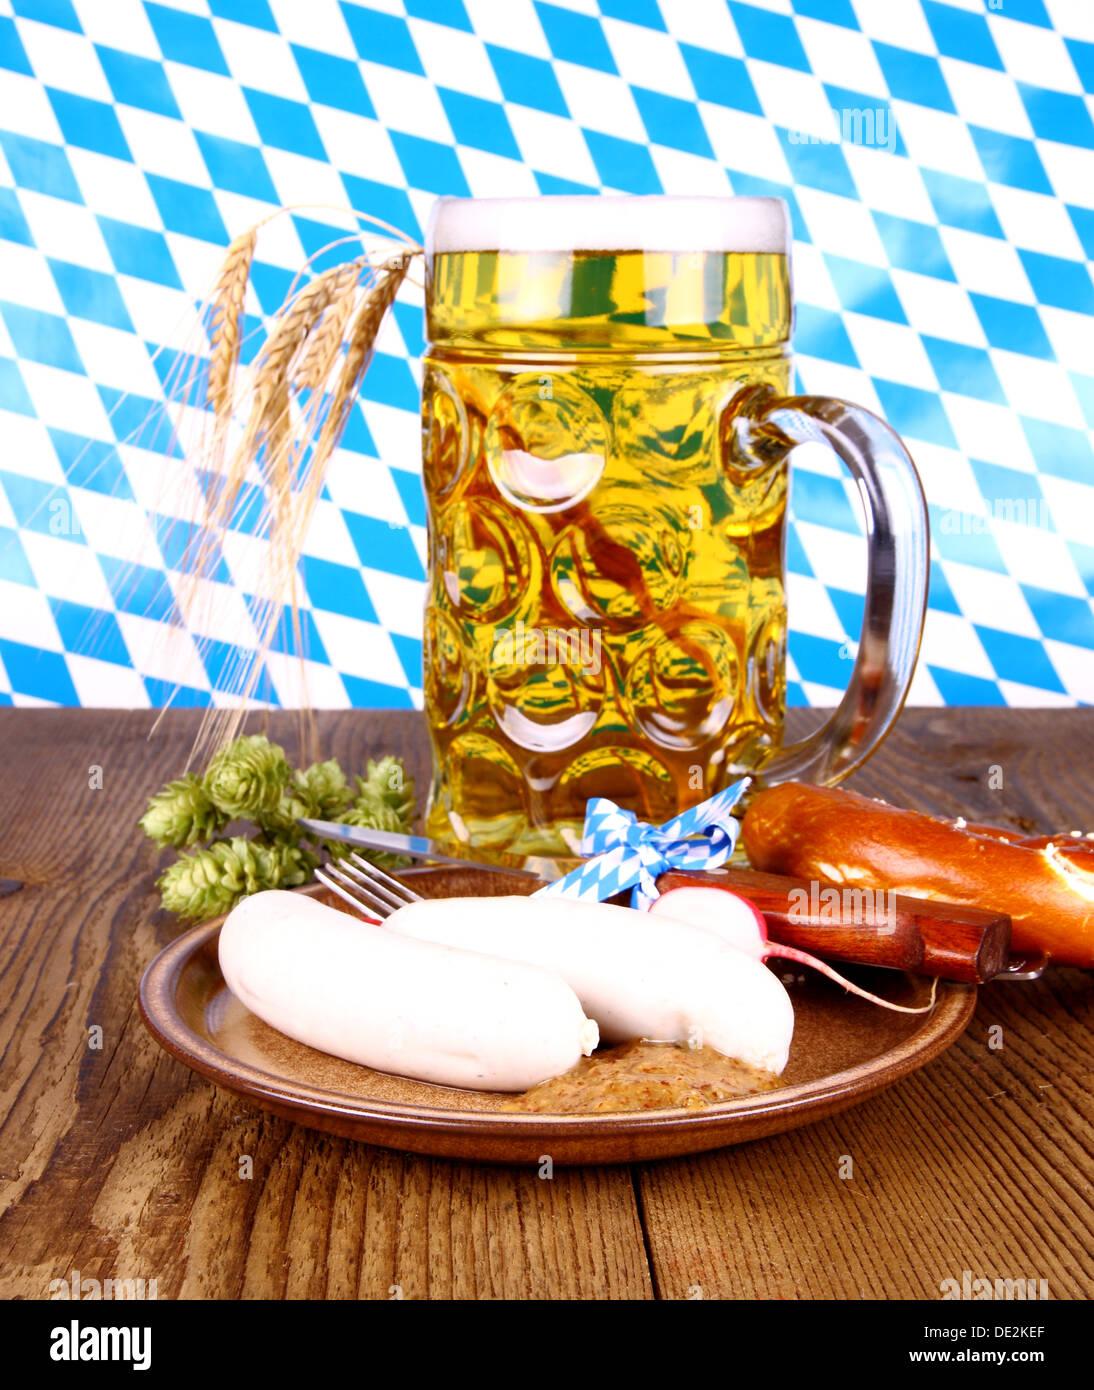 Oktoberfest menu with beer, white sausage, pretzel and radish Stock Photo